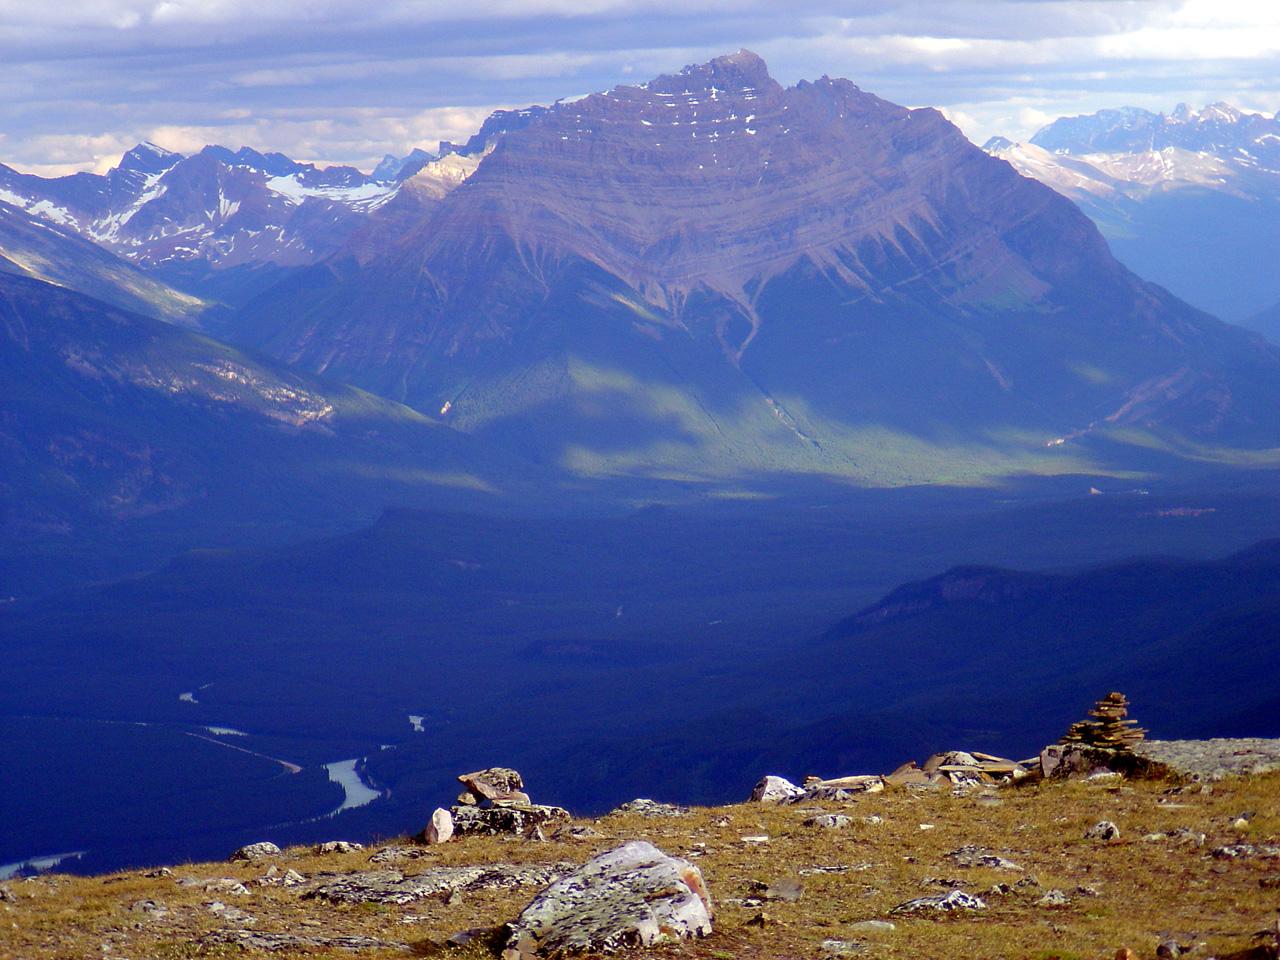 Jasper National Park Photo Crazy View From Whistler S Mtn Dh Wall S Jasper Journal